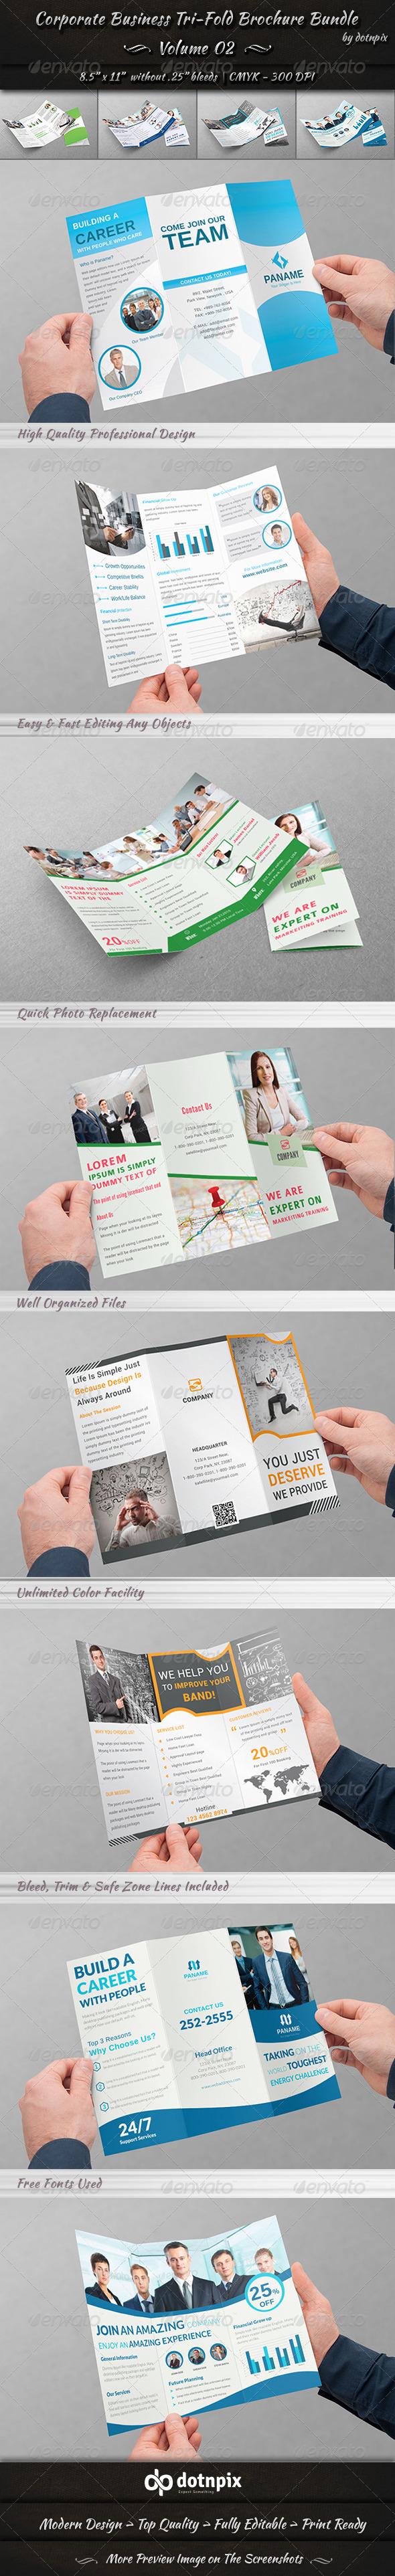 GraphicRiver Corporate Business Tri-Fold Brochure Bundle v2 8230324